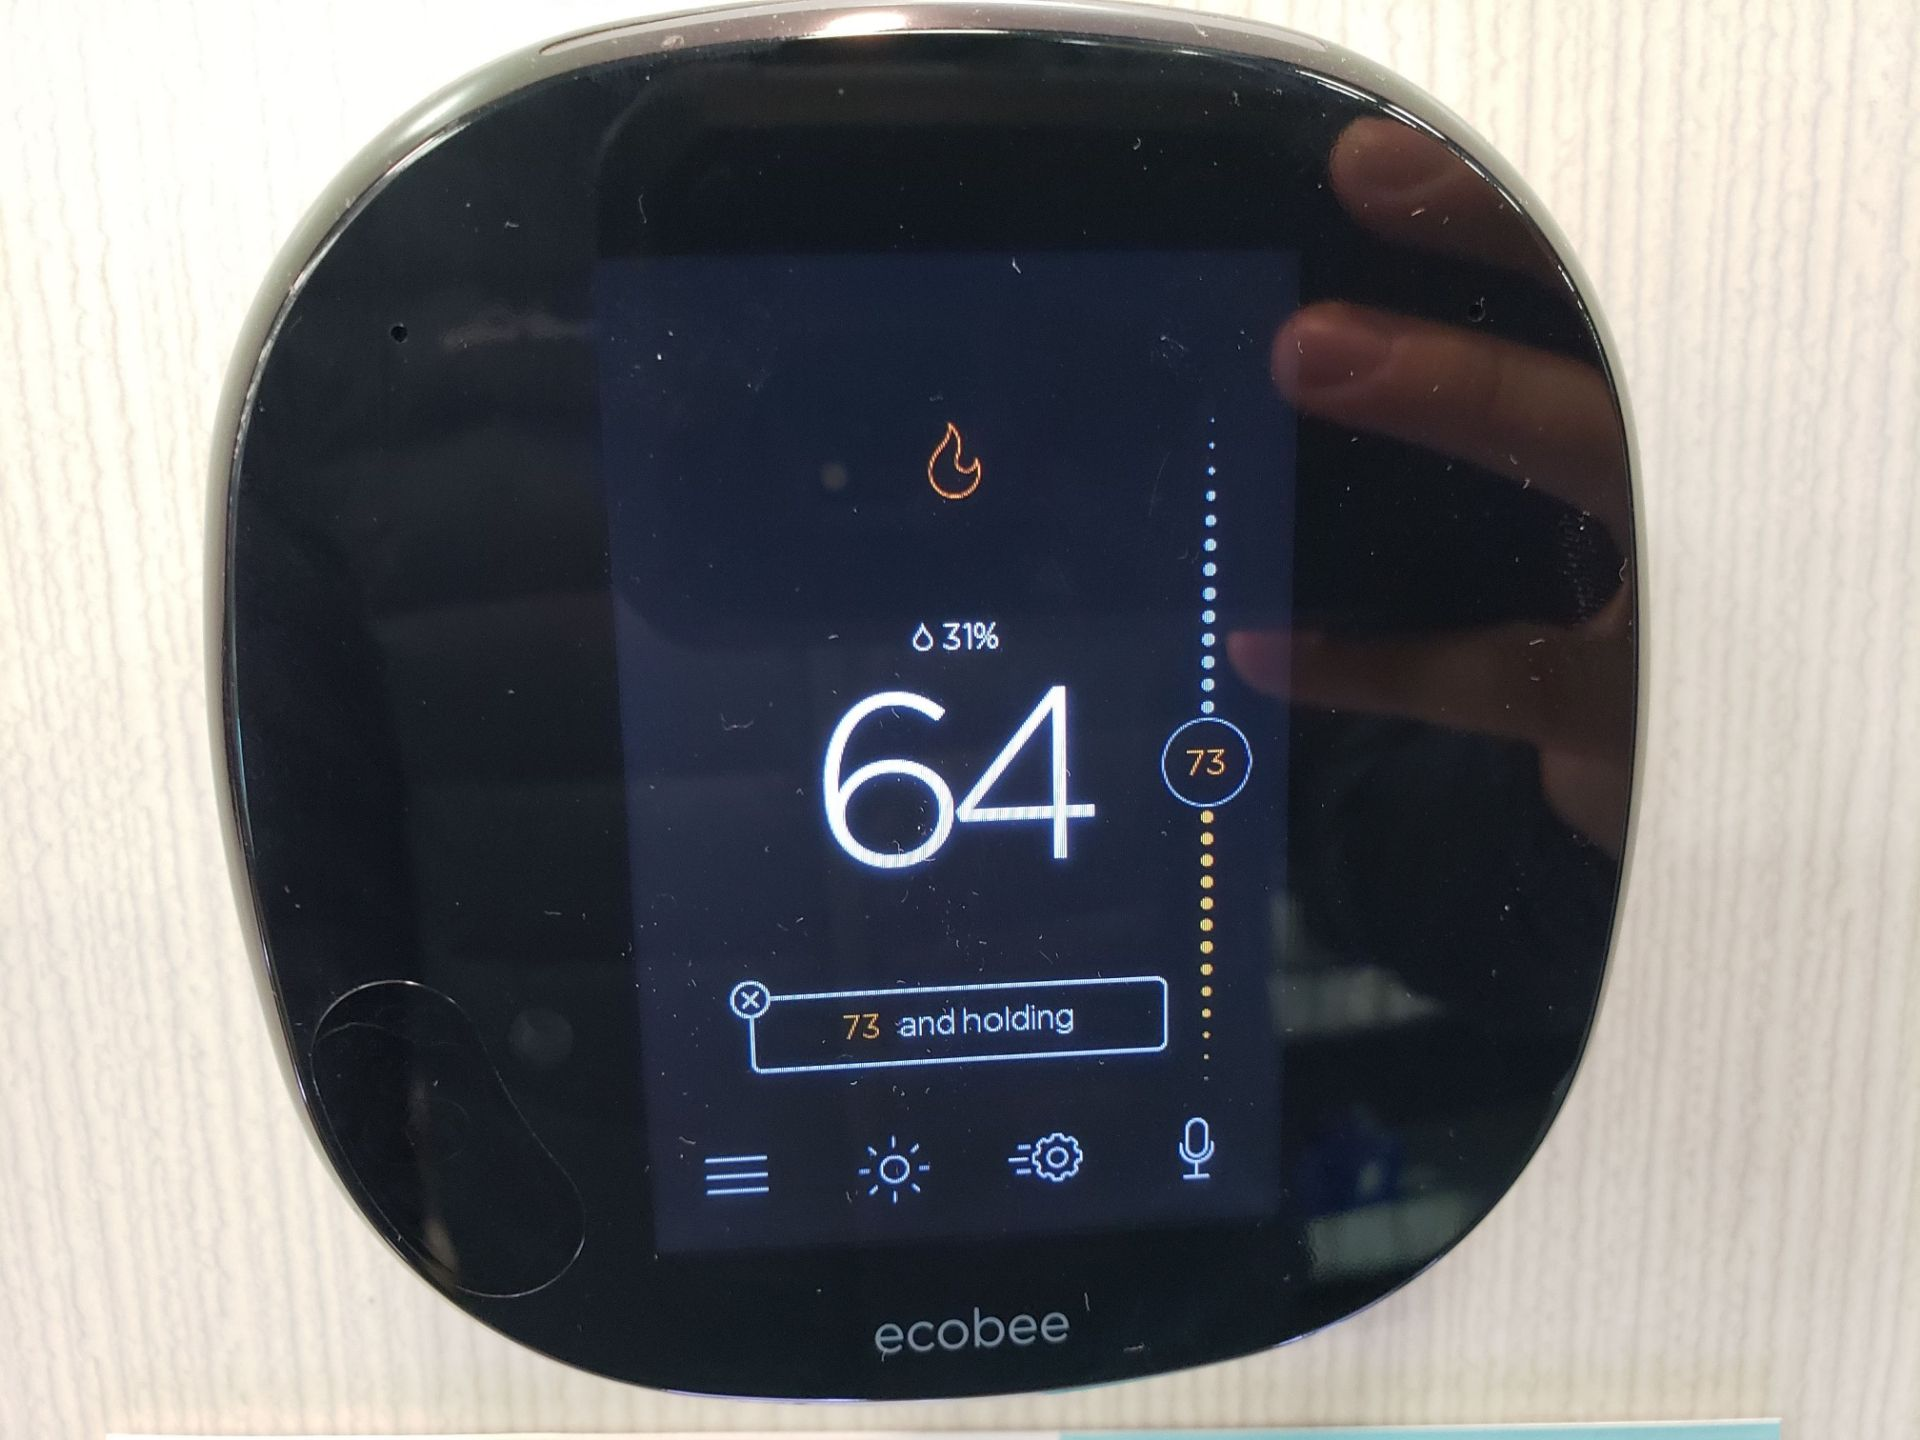 Learn Ecobee HomeKit Commands and How Ecobee Works With HomeKit